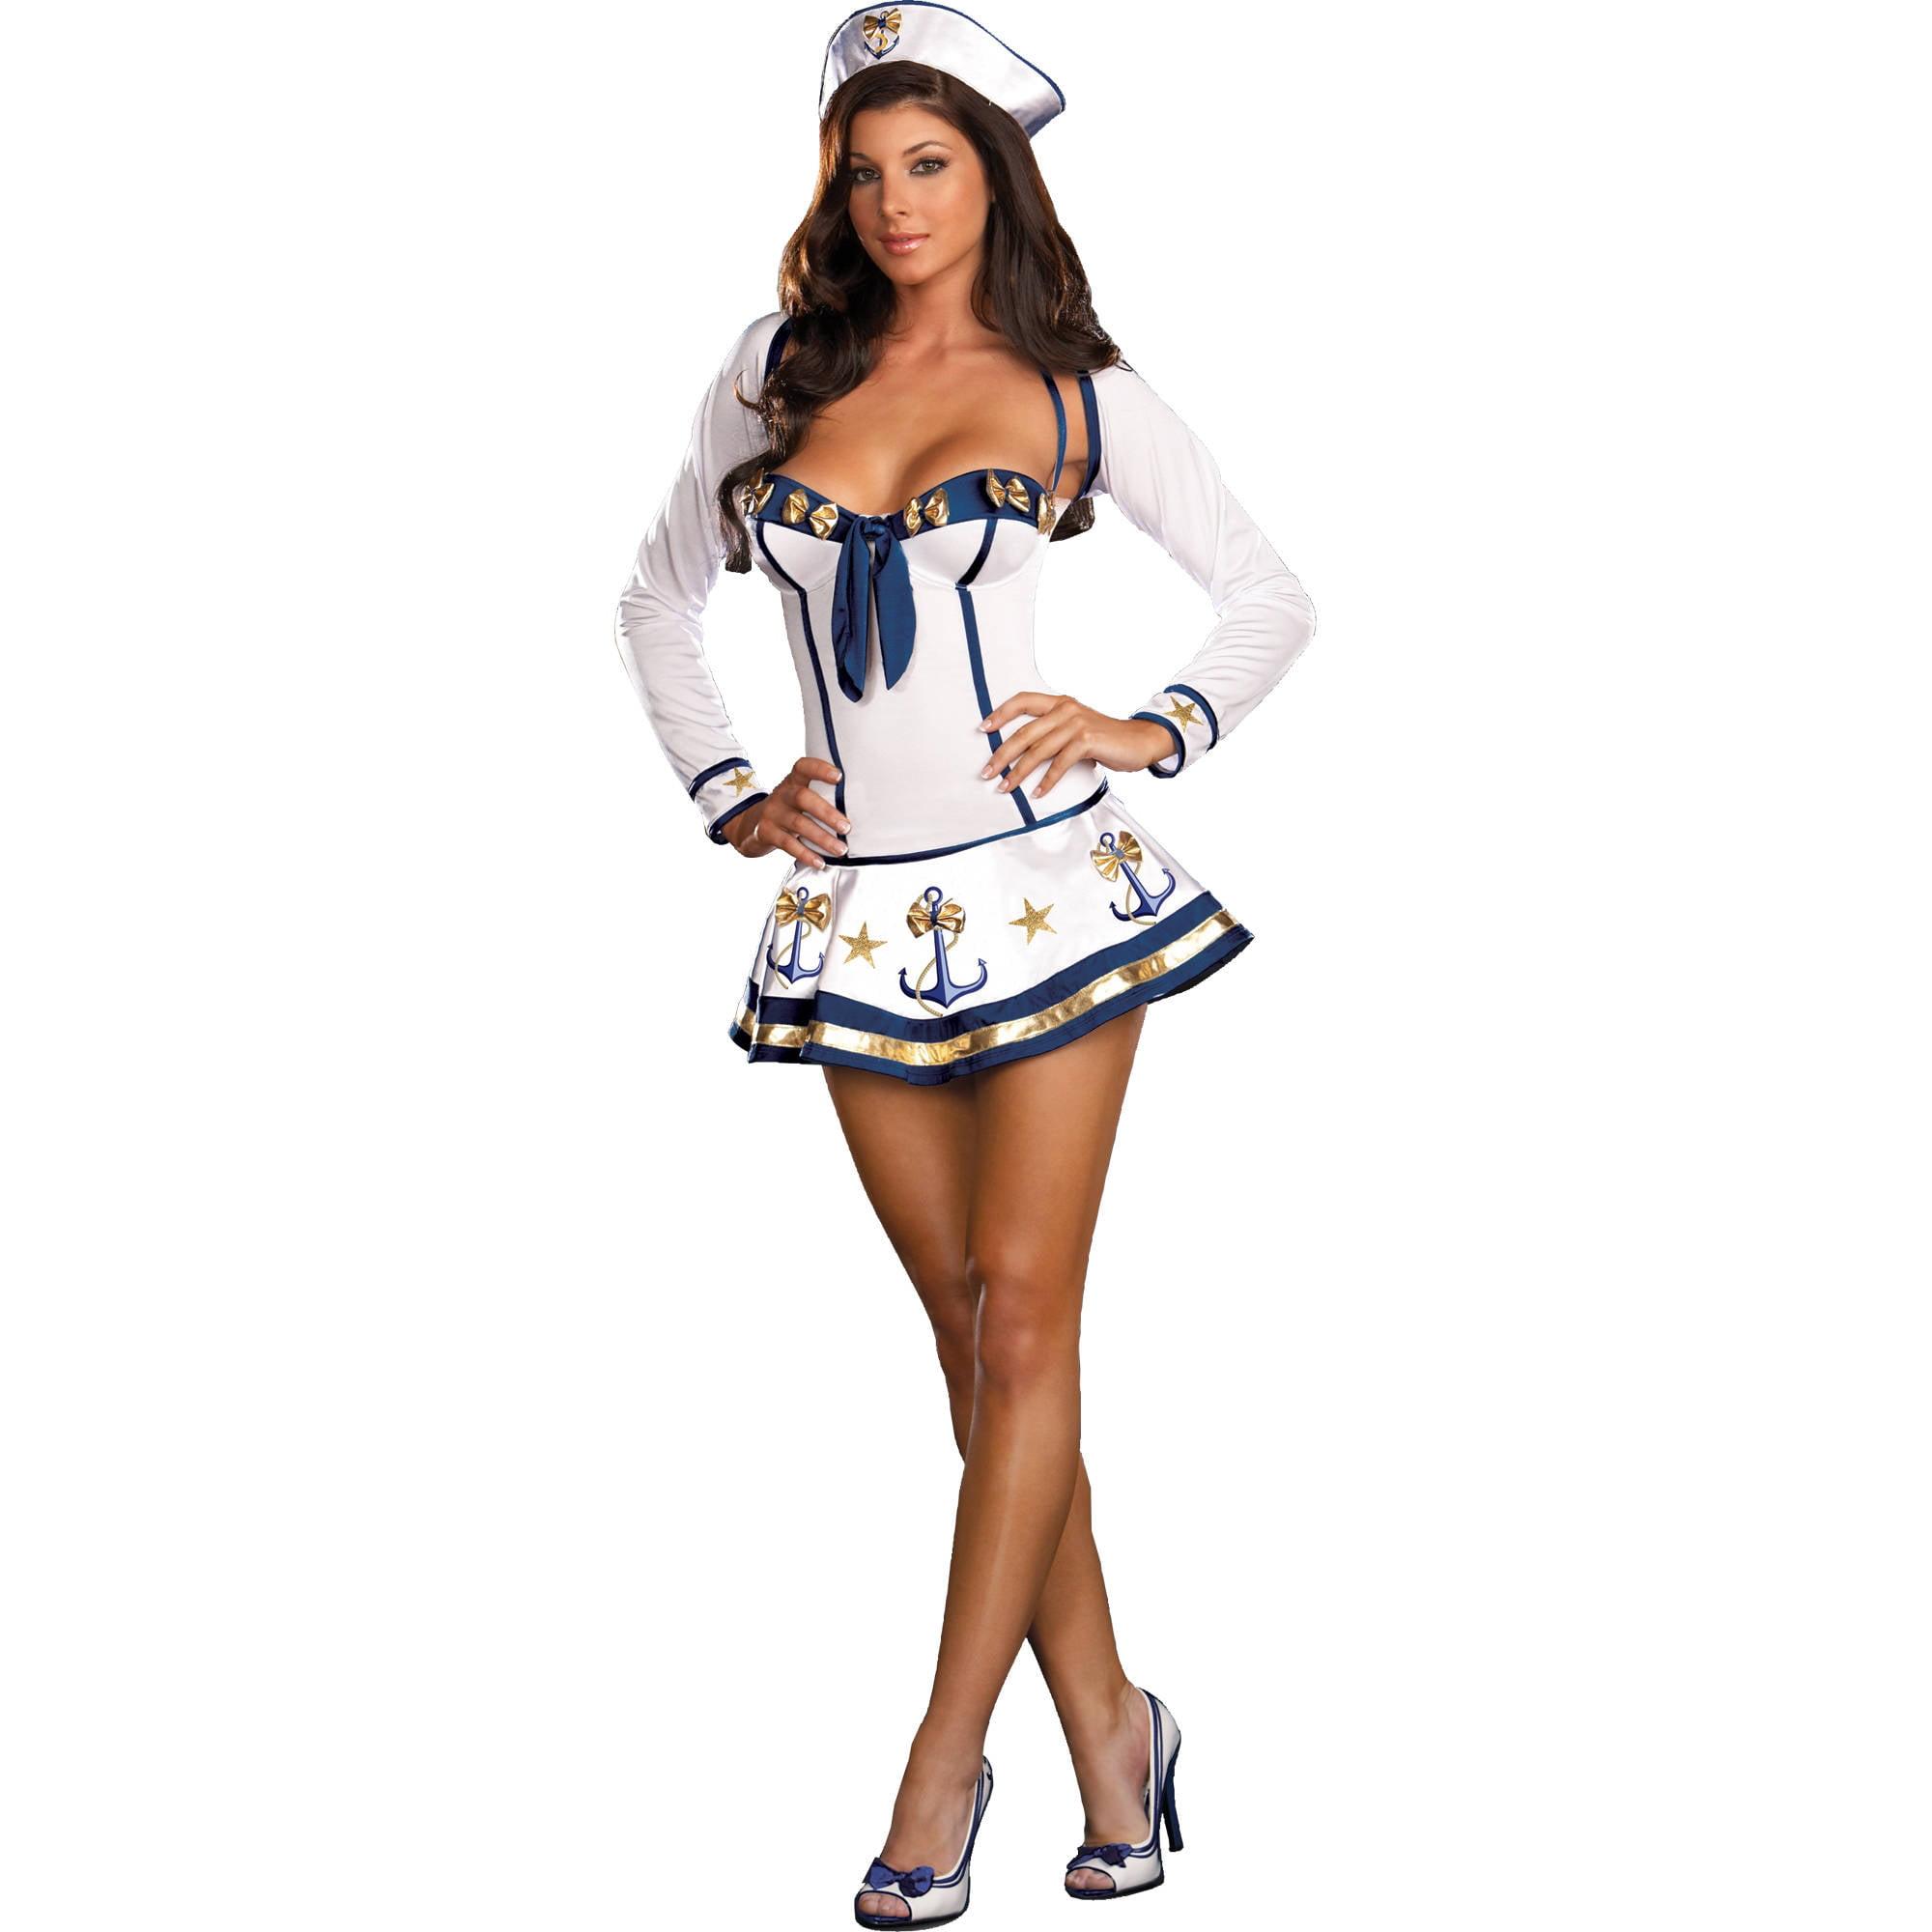 Makin' Waves Women's Plus Size Adult Halloween Costume